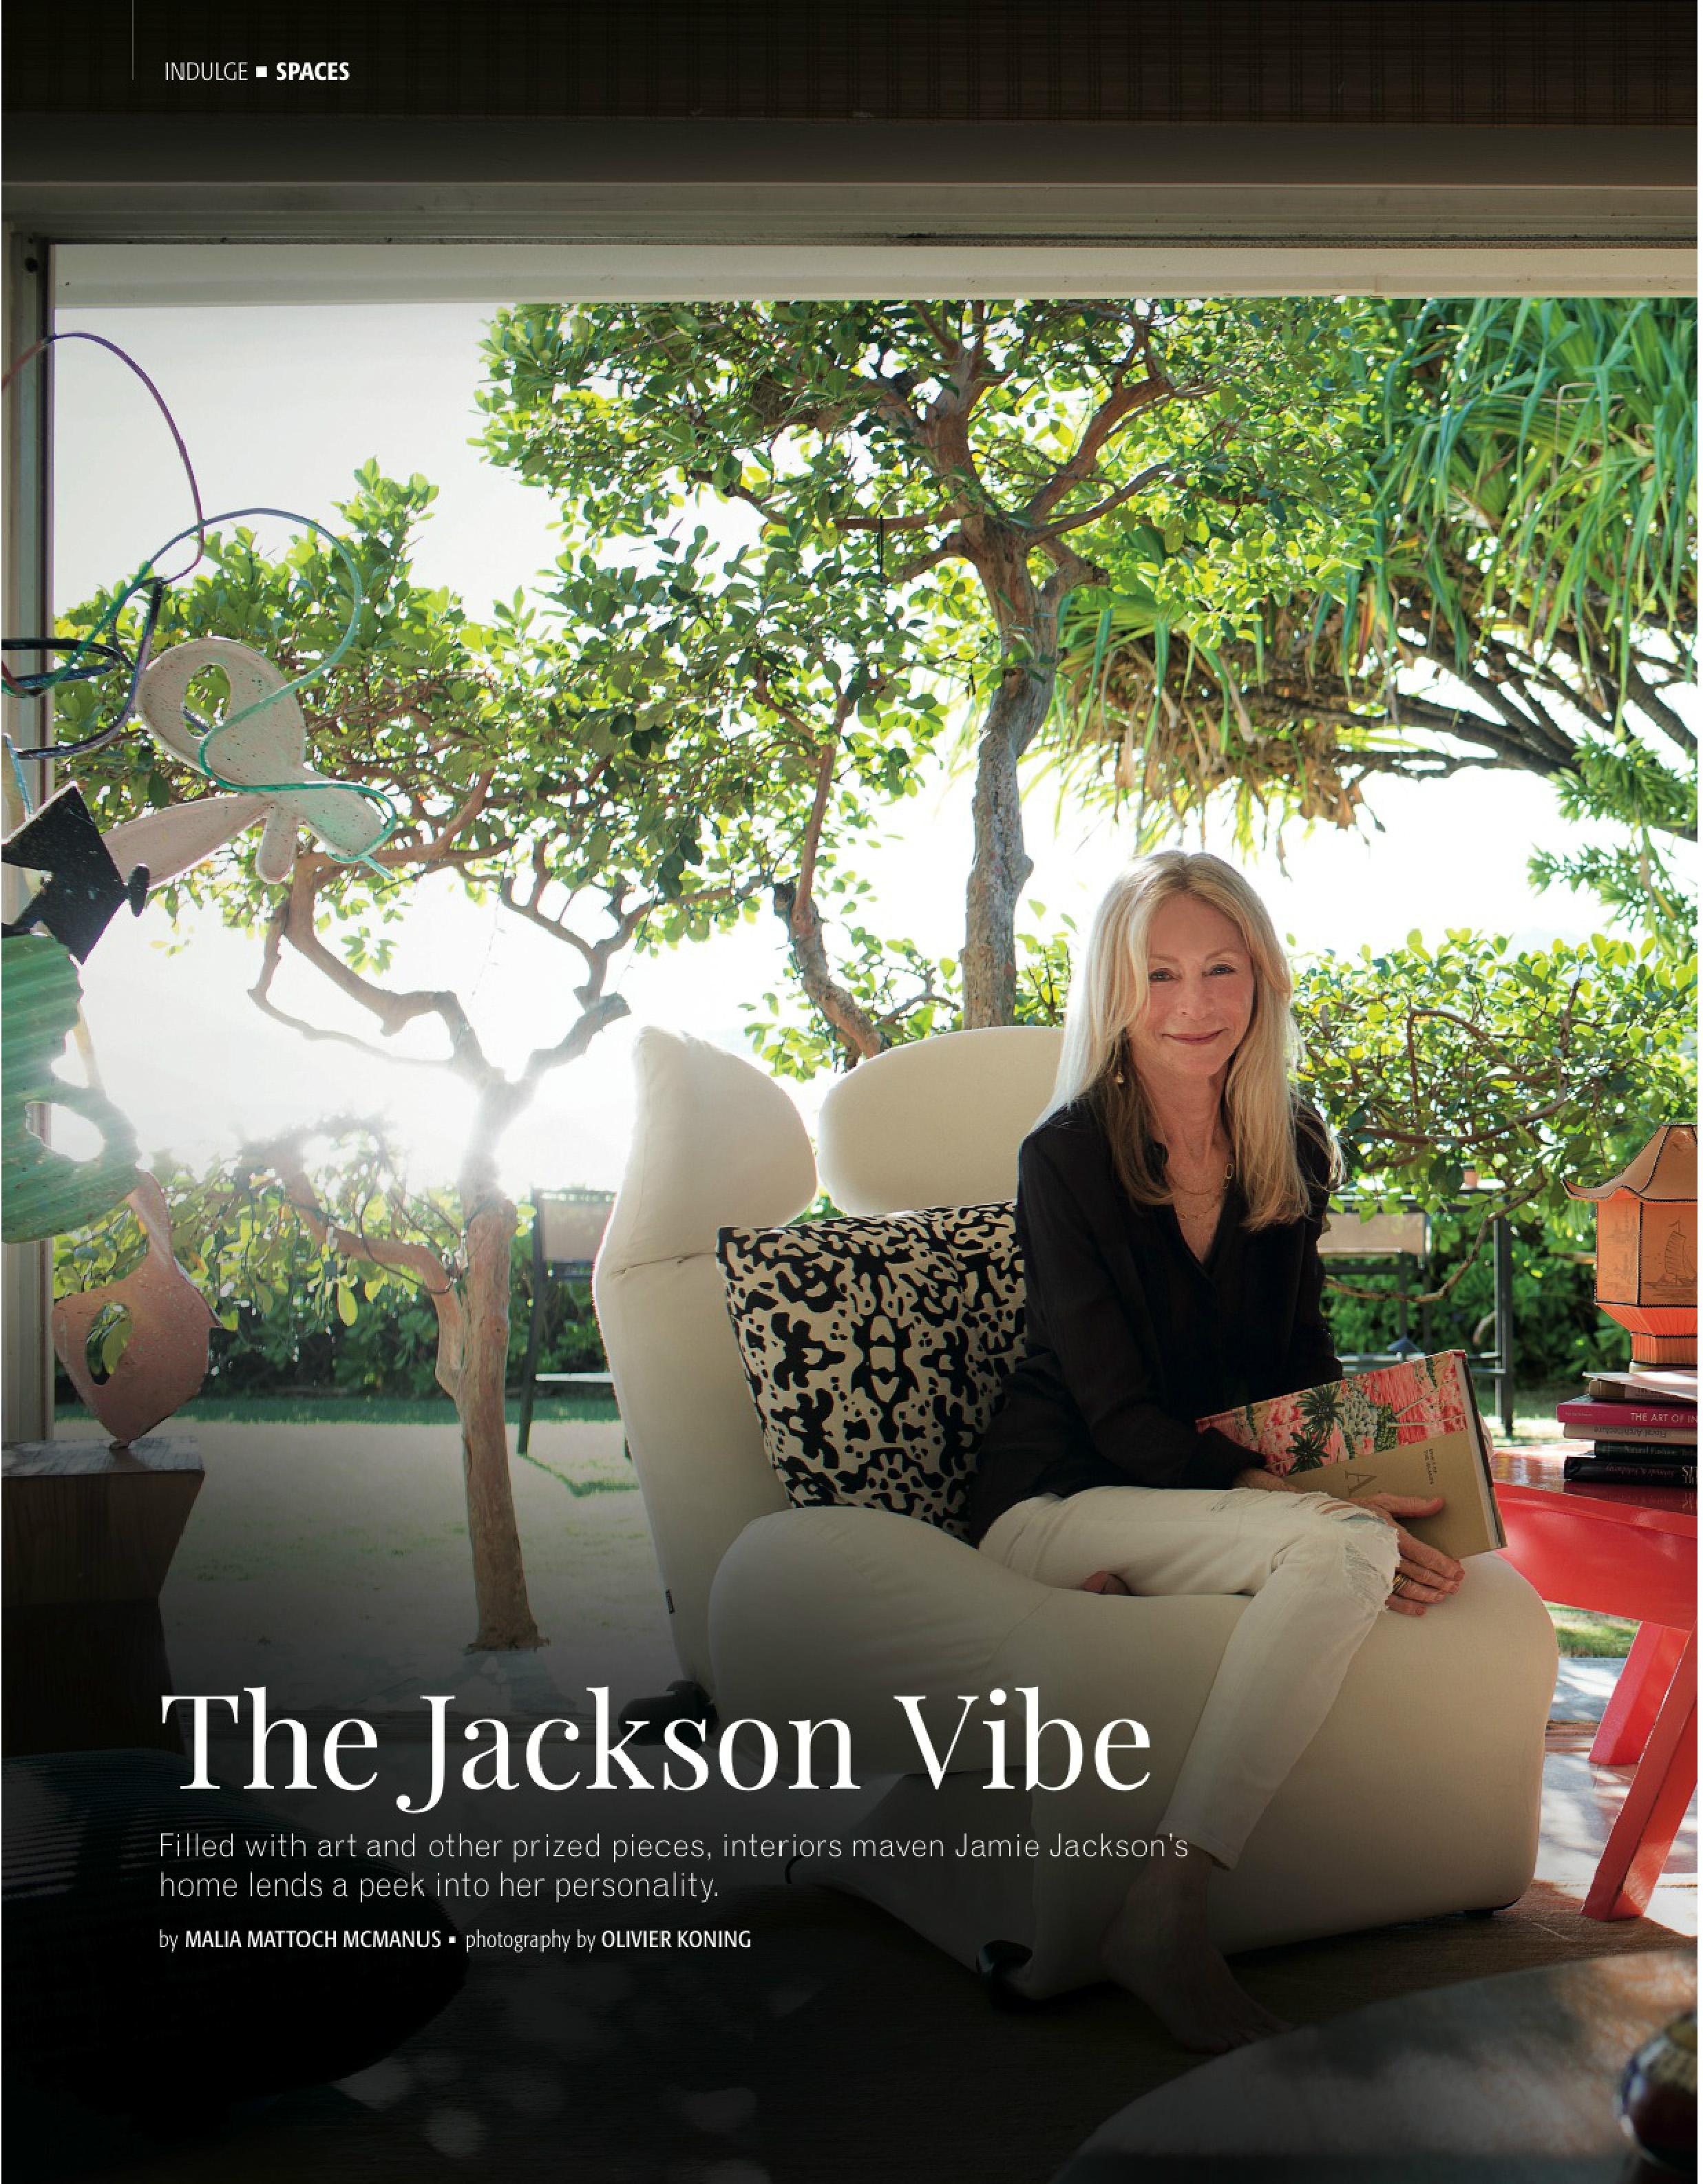 The Jackson Vibe